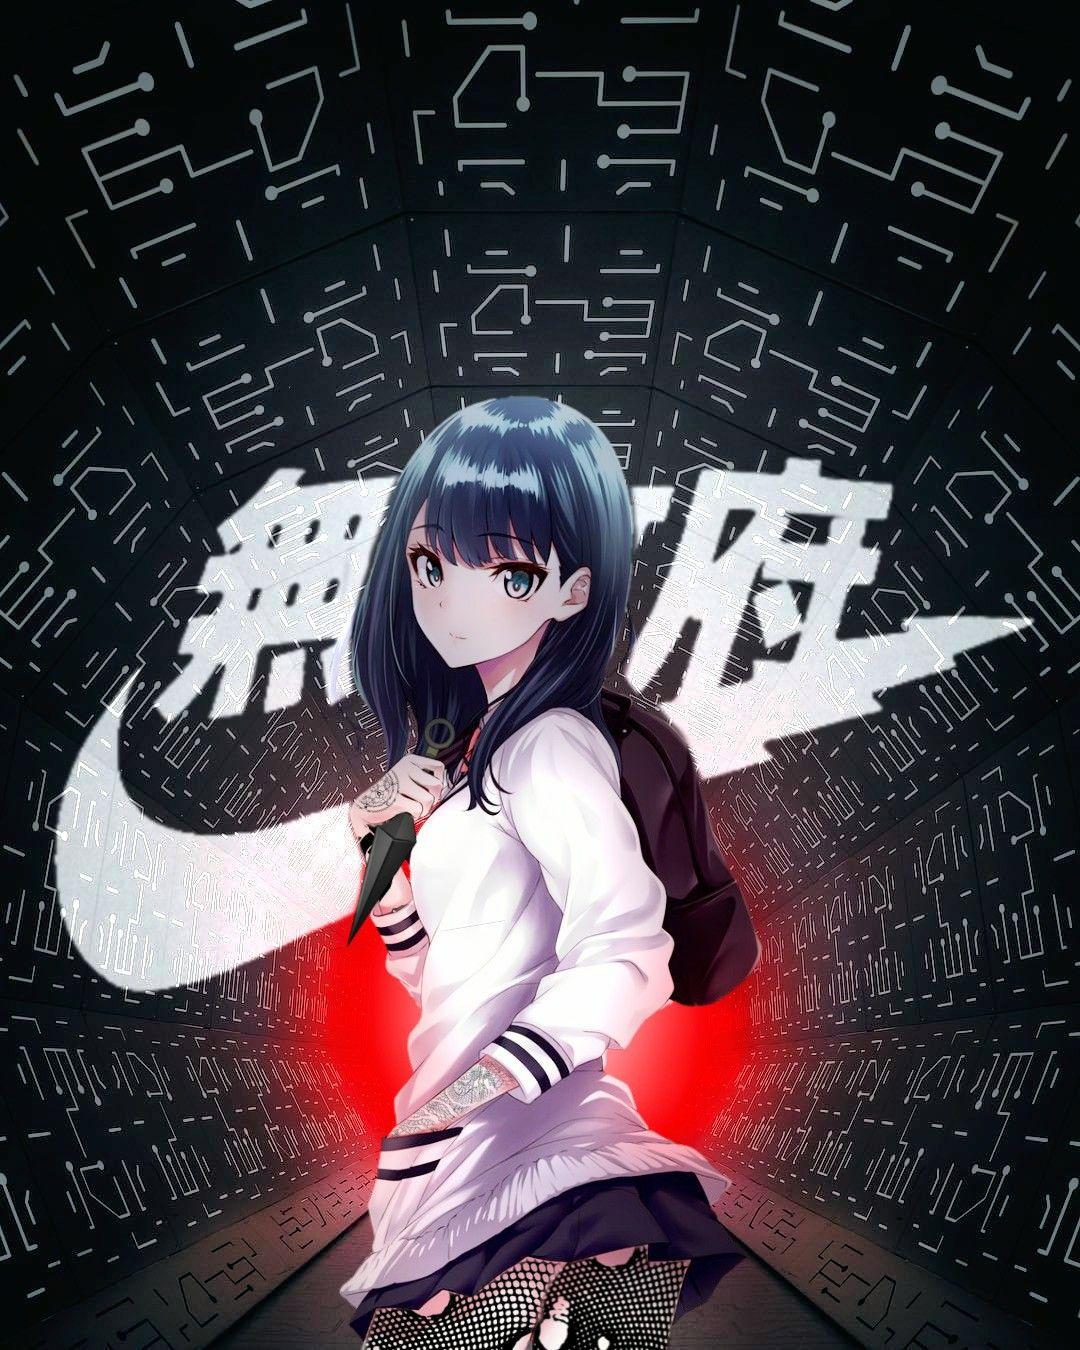 #animeedit #animeaesthetic #aestheticanime #artworksclub # ...